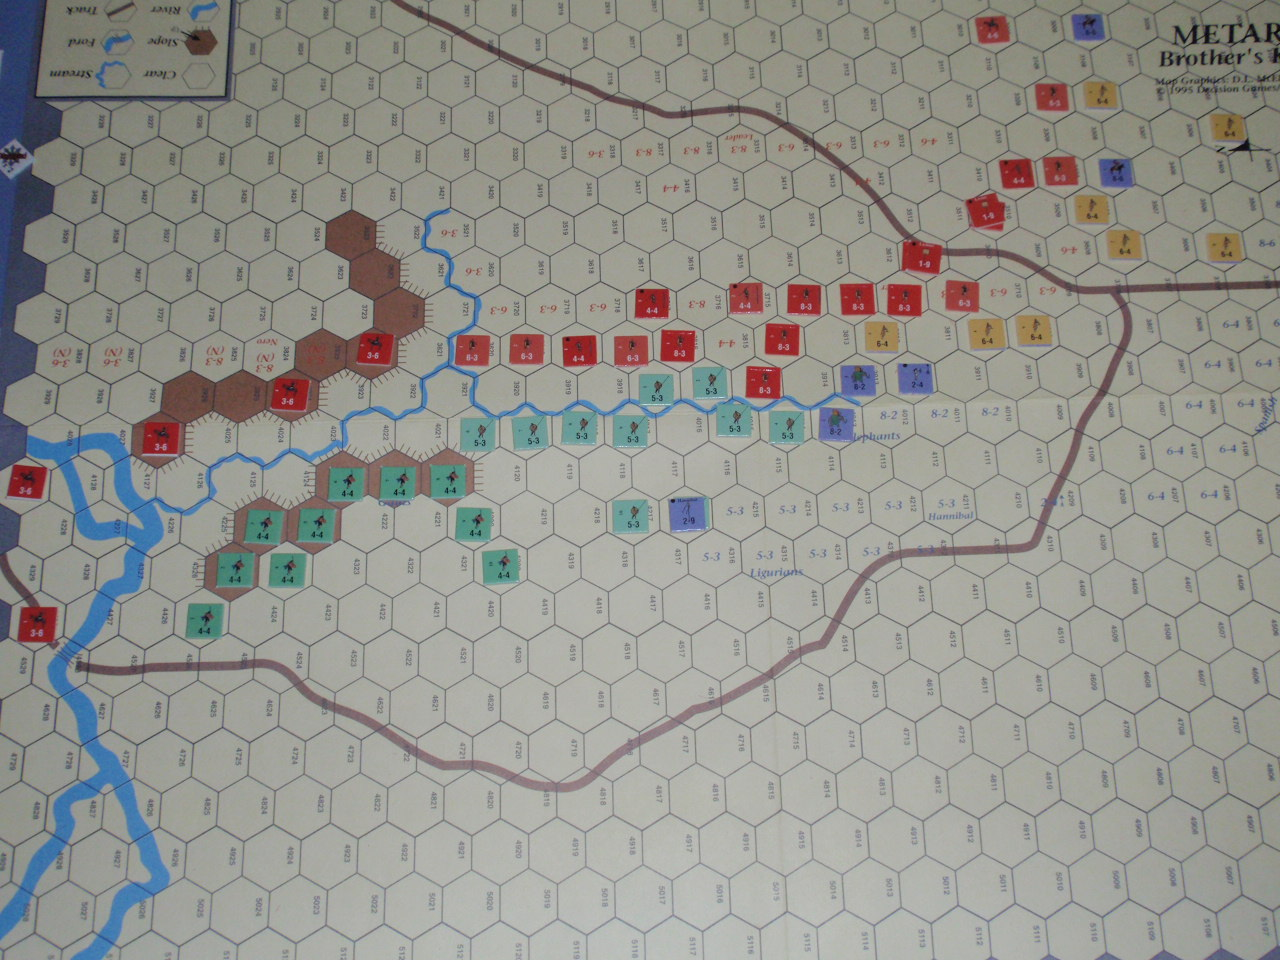 DG「Battles of the Ancient World」シリーズから「Metauras 207B.C.」をソロプレイ②_b0162202_20154231.jpg